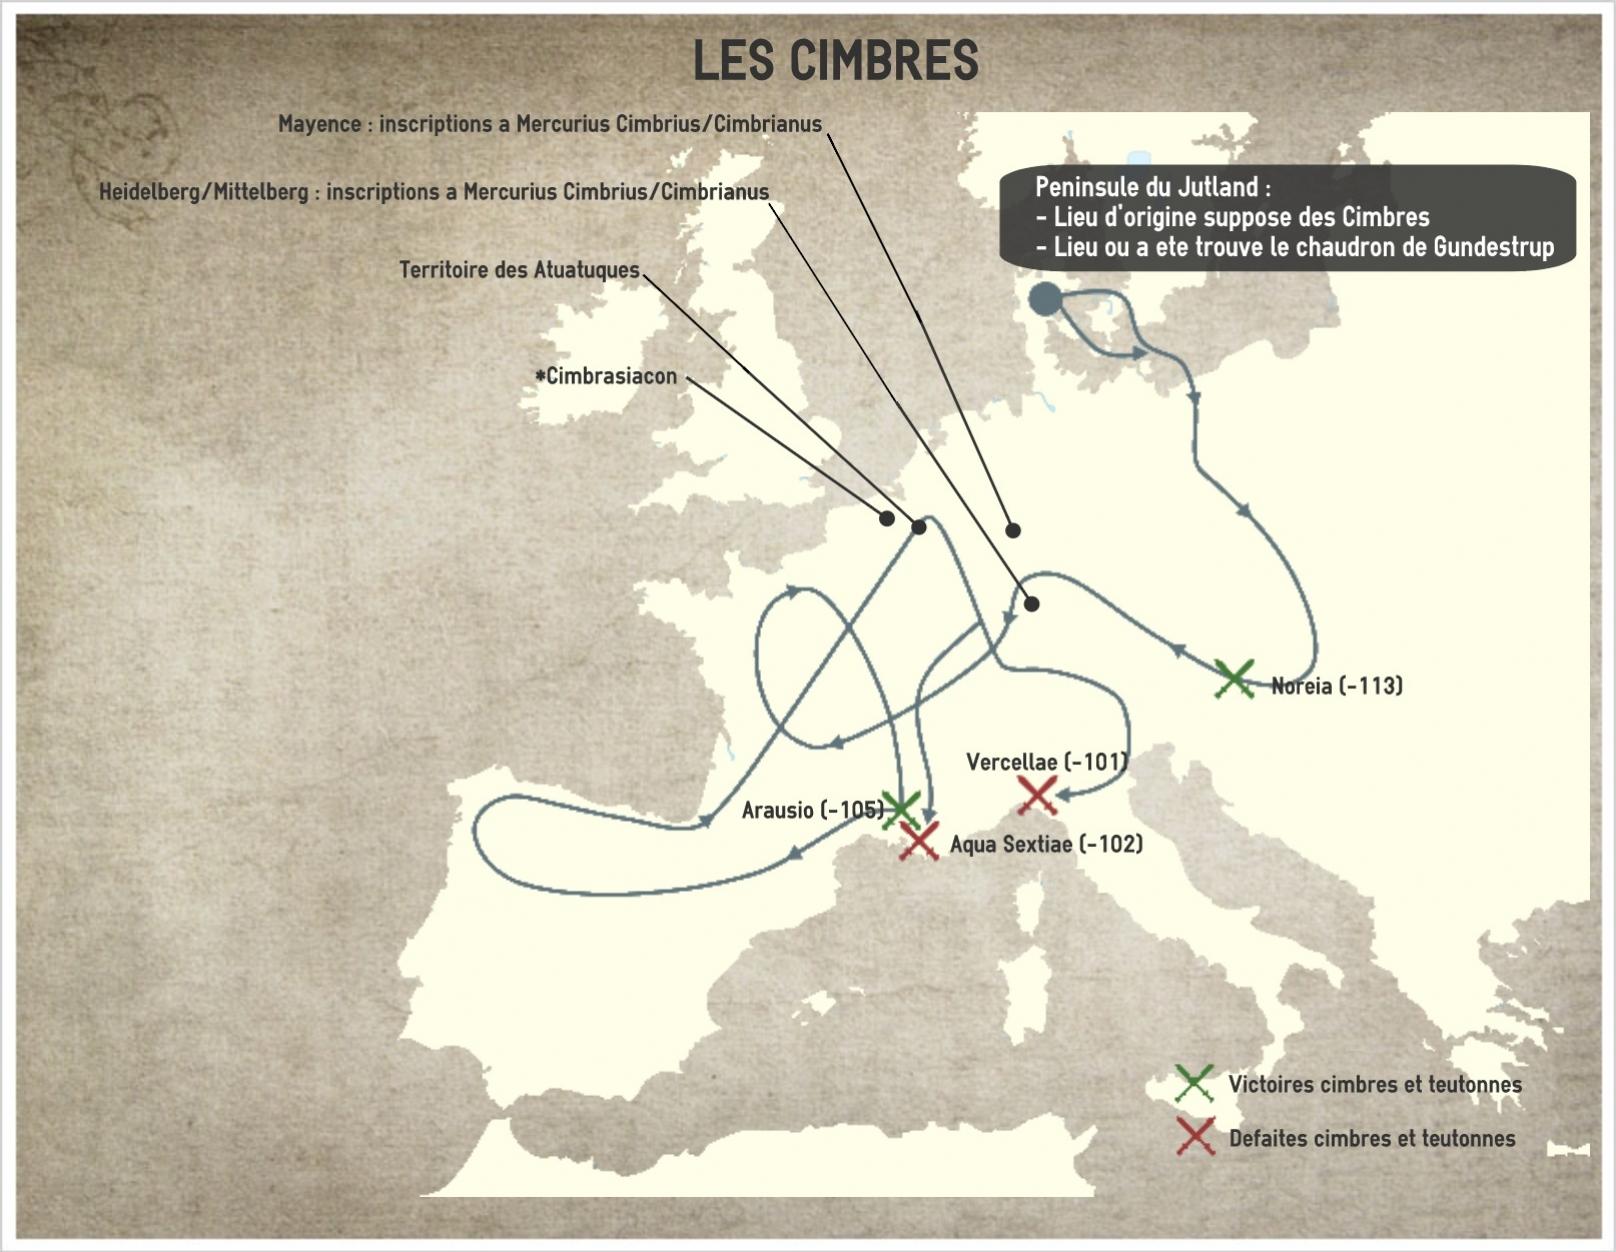 Cimbres - carte migratoire